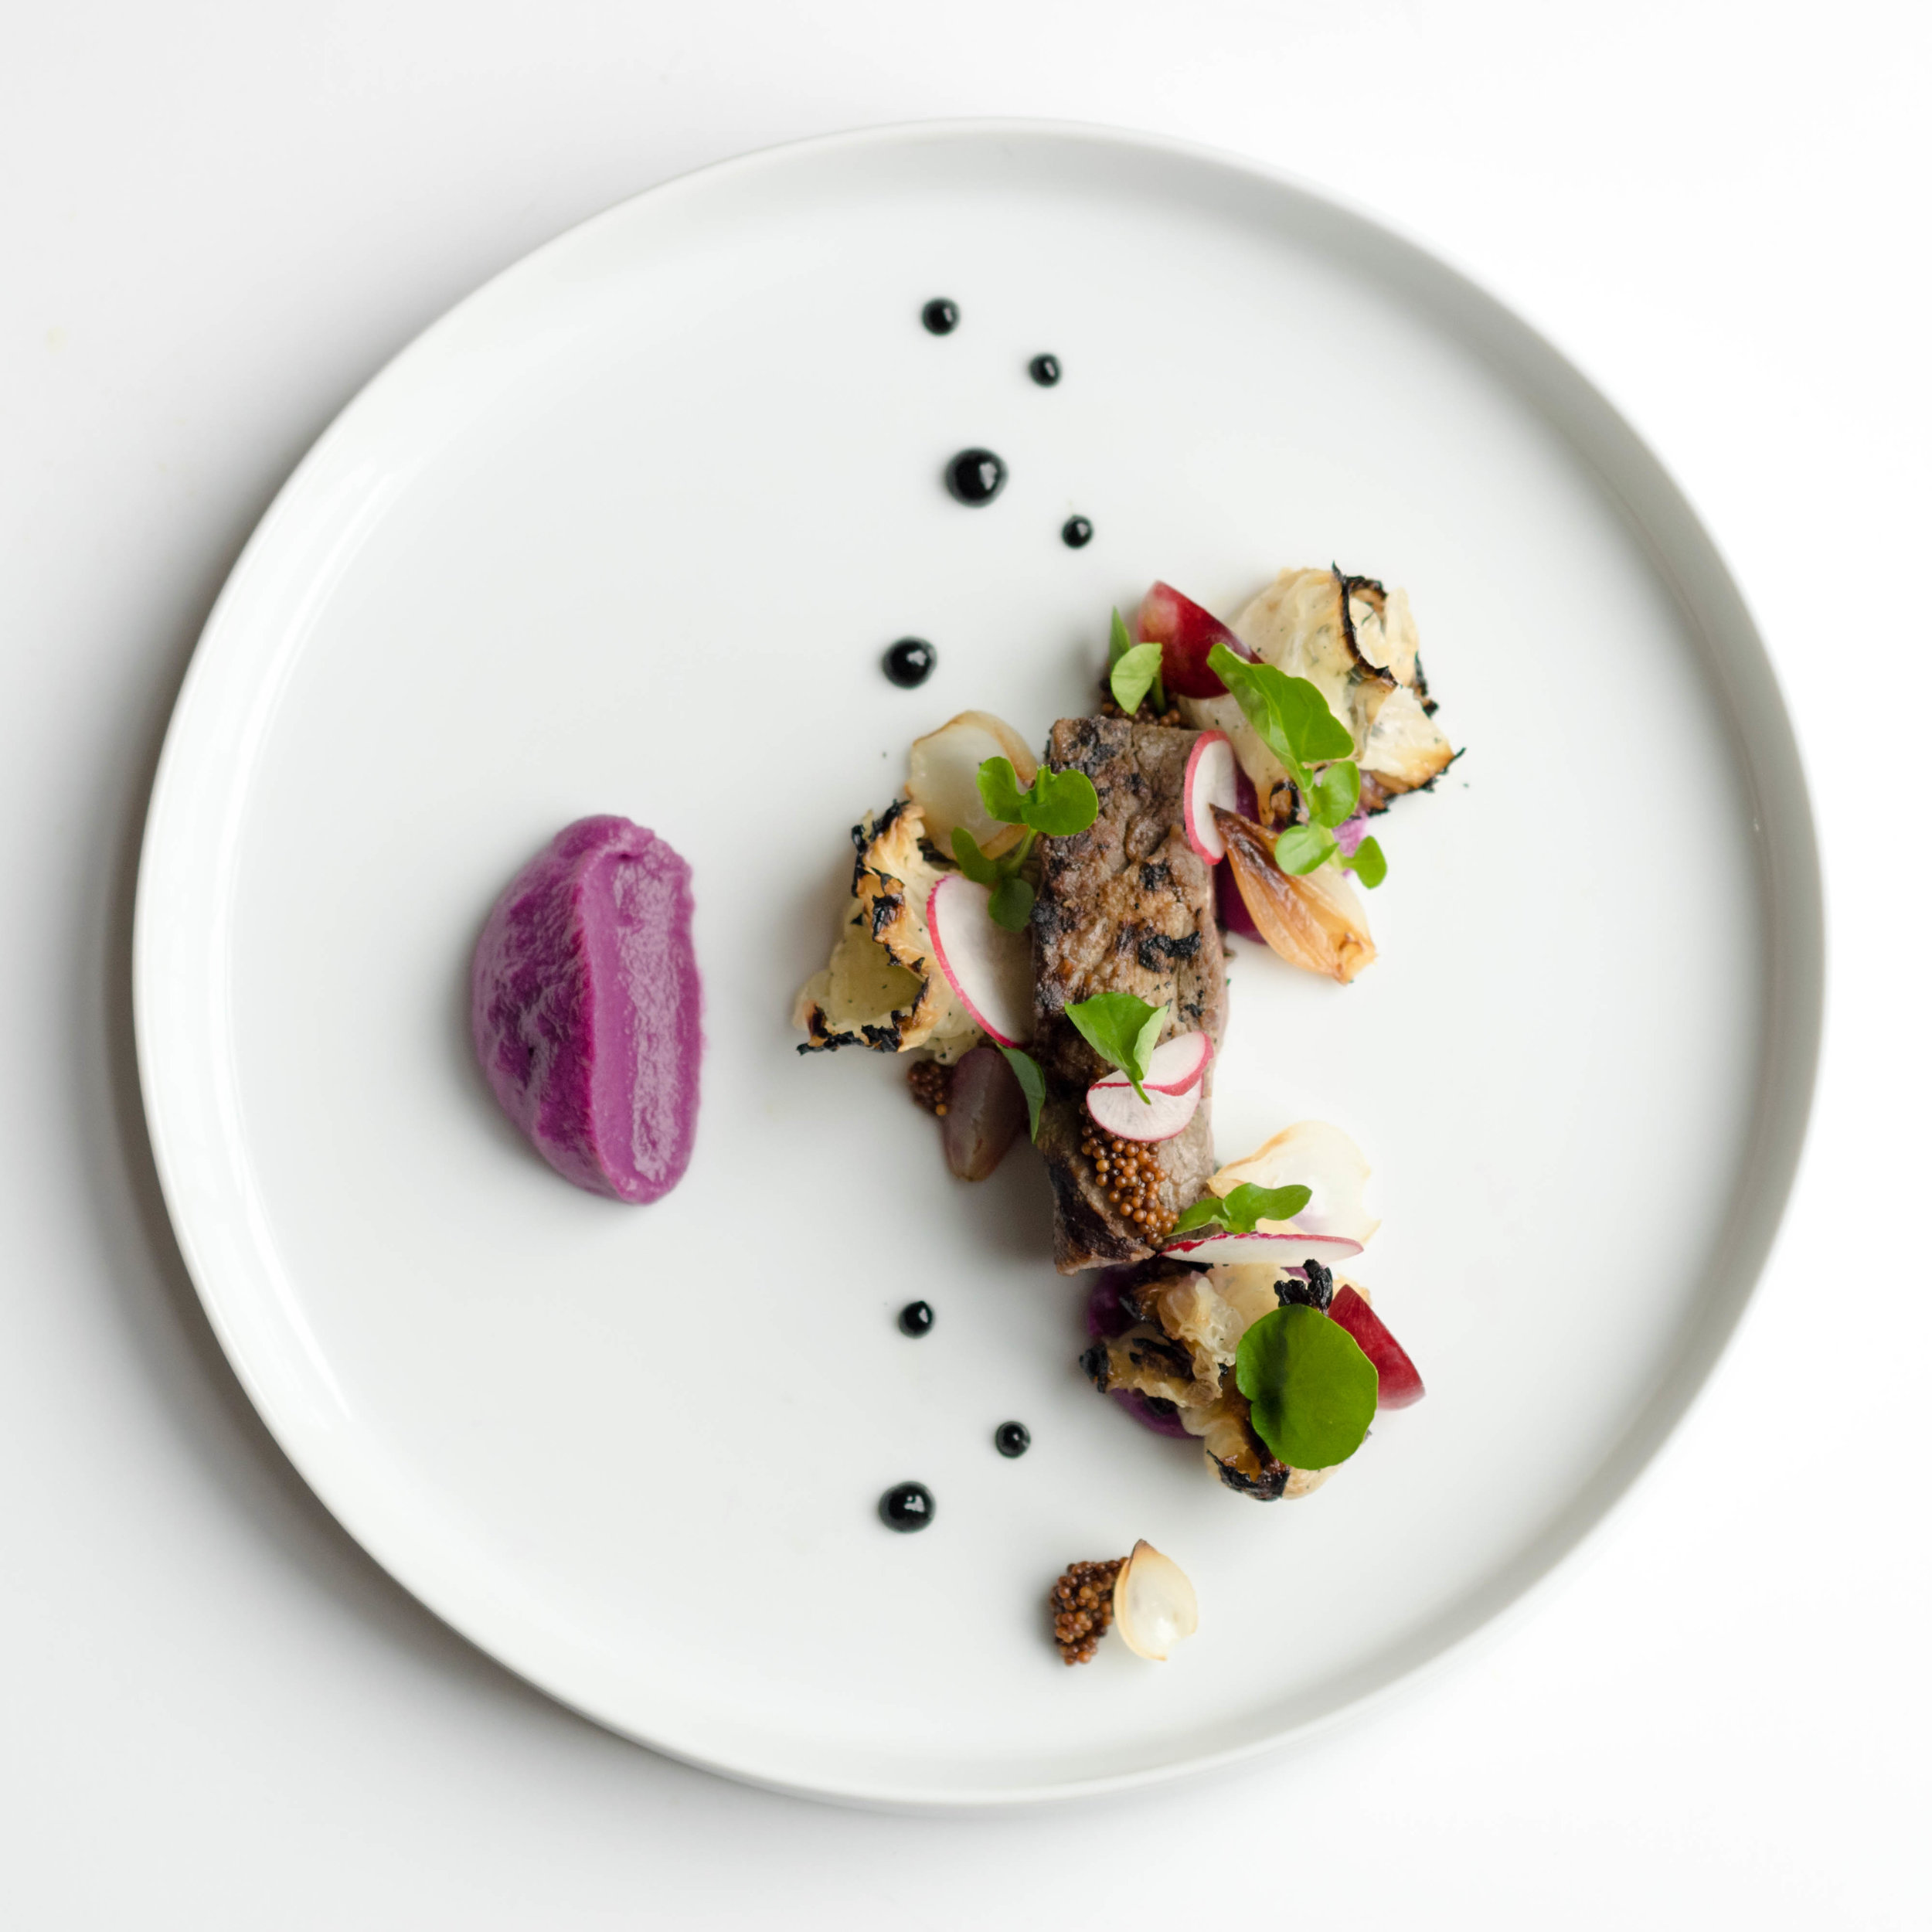 Stunning Shortrib Dish, Styling & Photography by Jenny Dorsey.